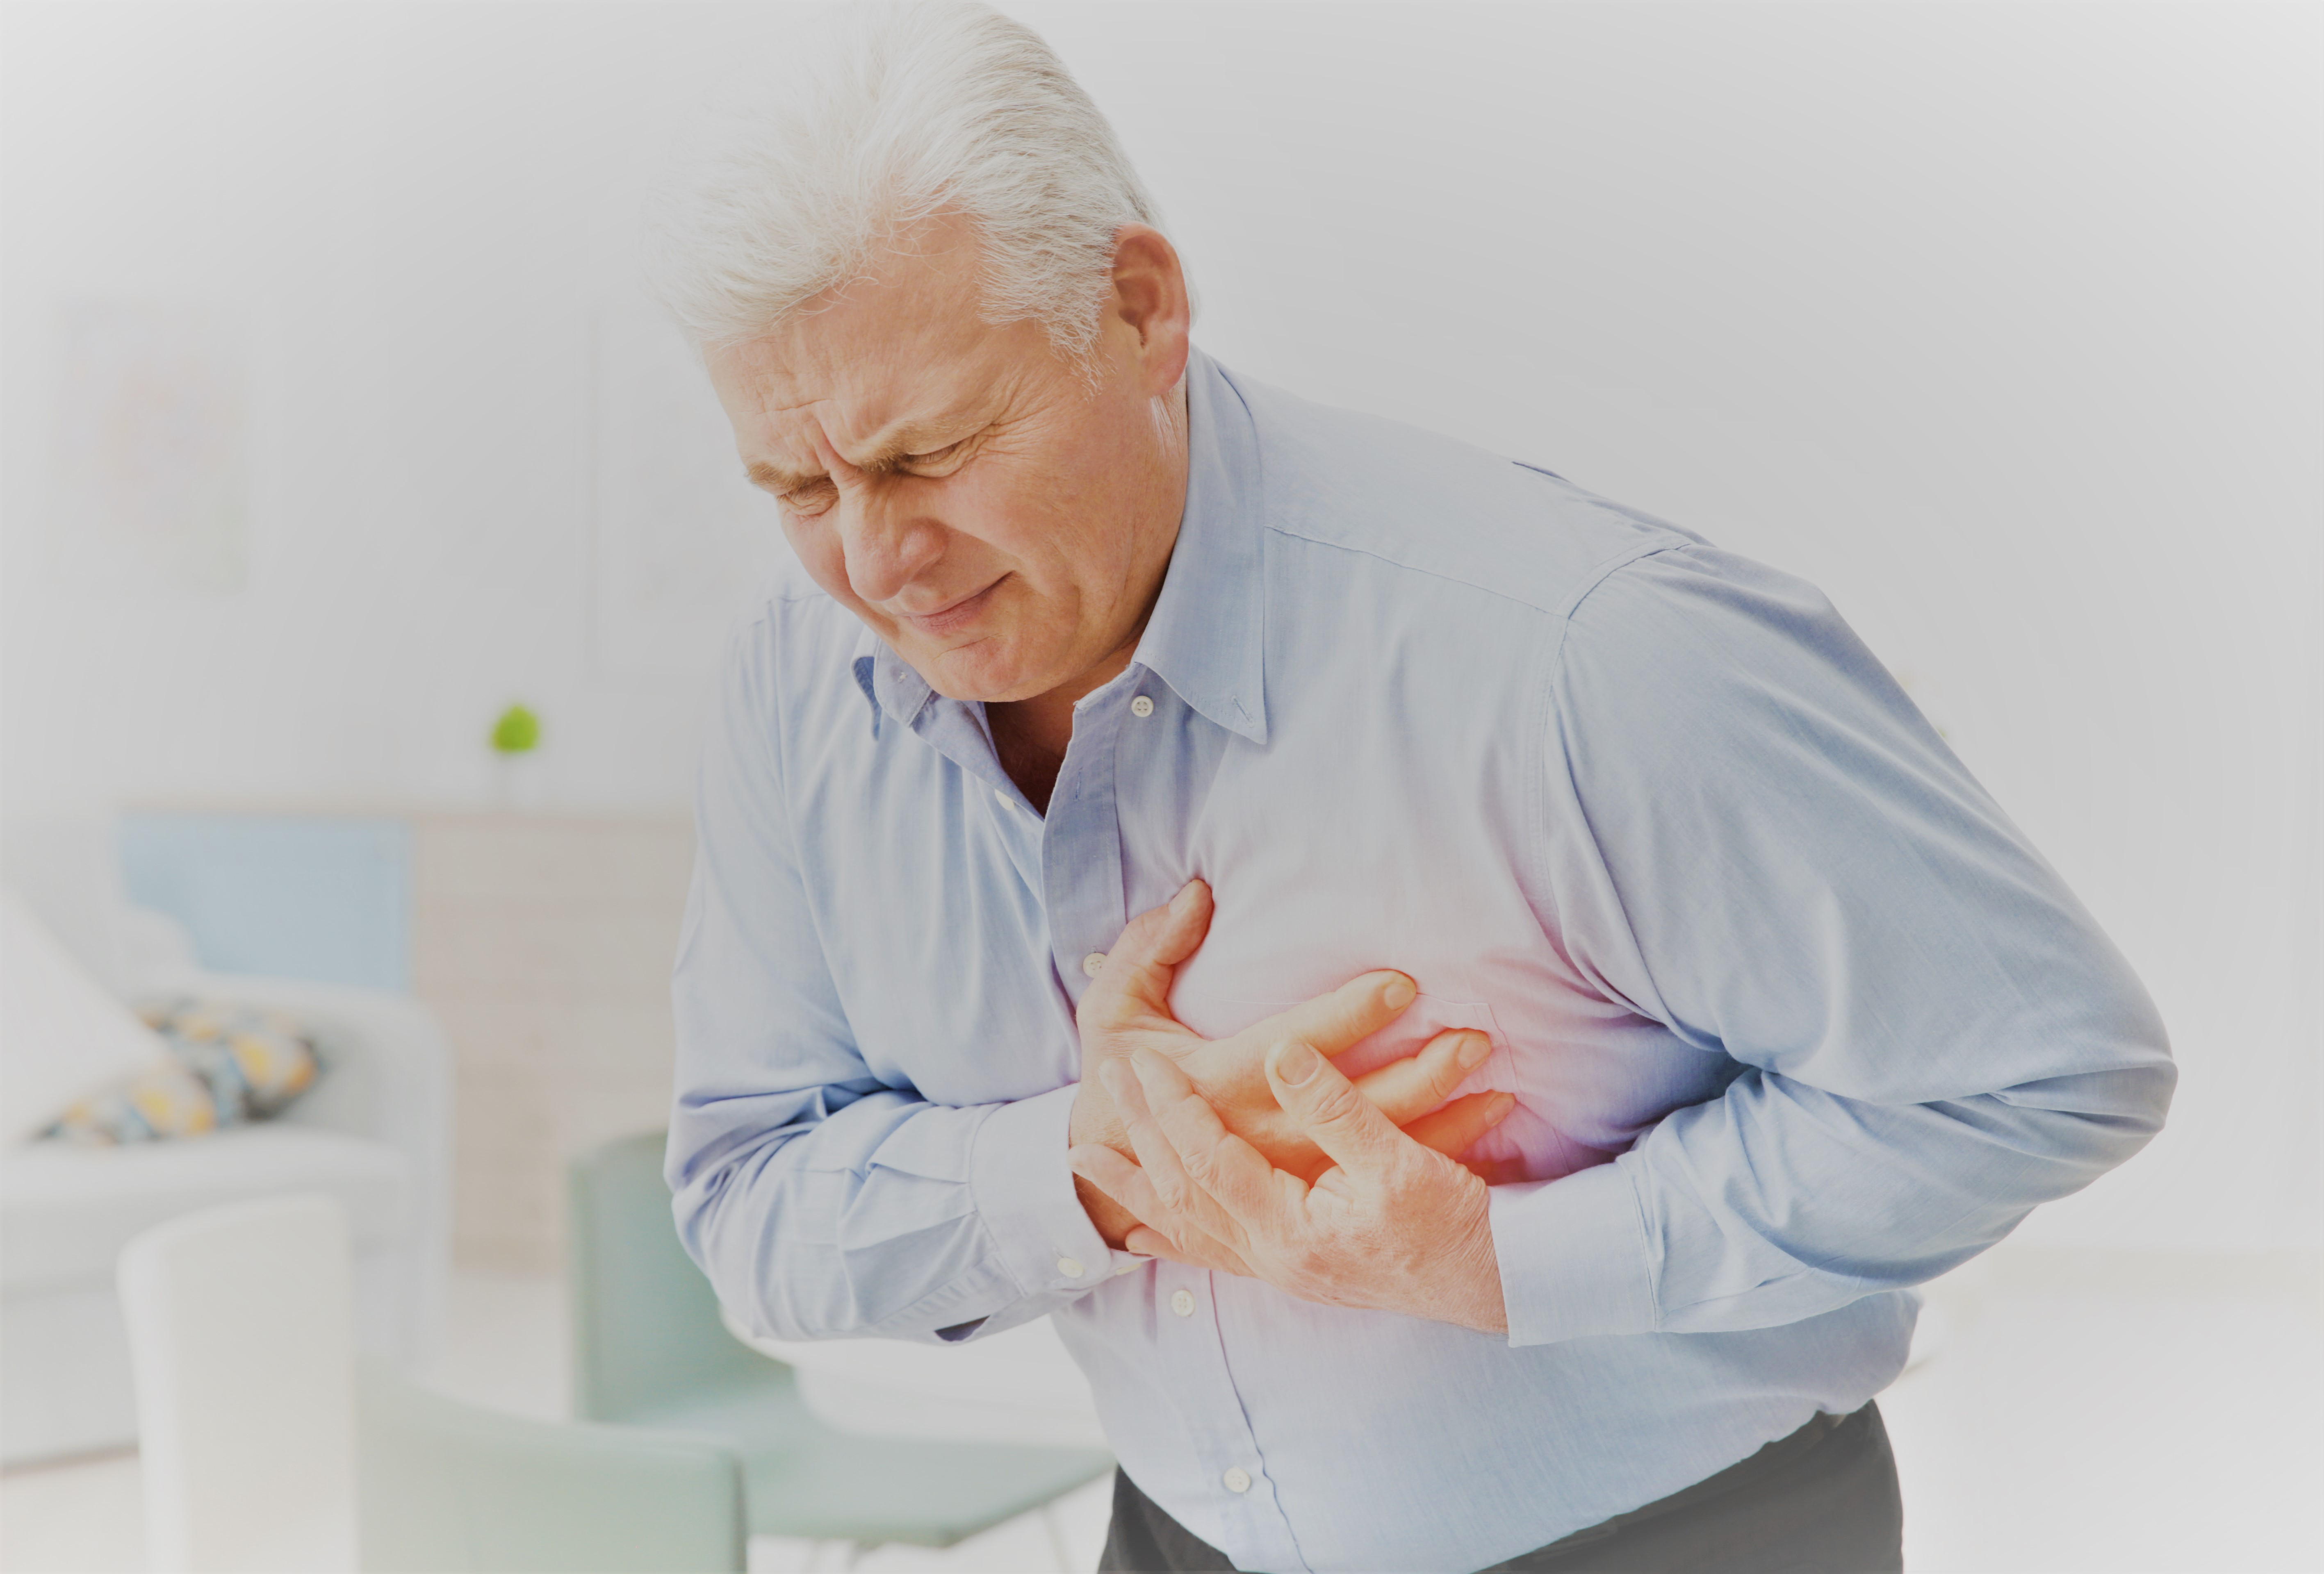 Mellkasi fájdalom: mi okozhatja?